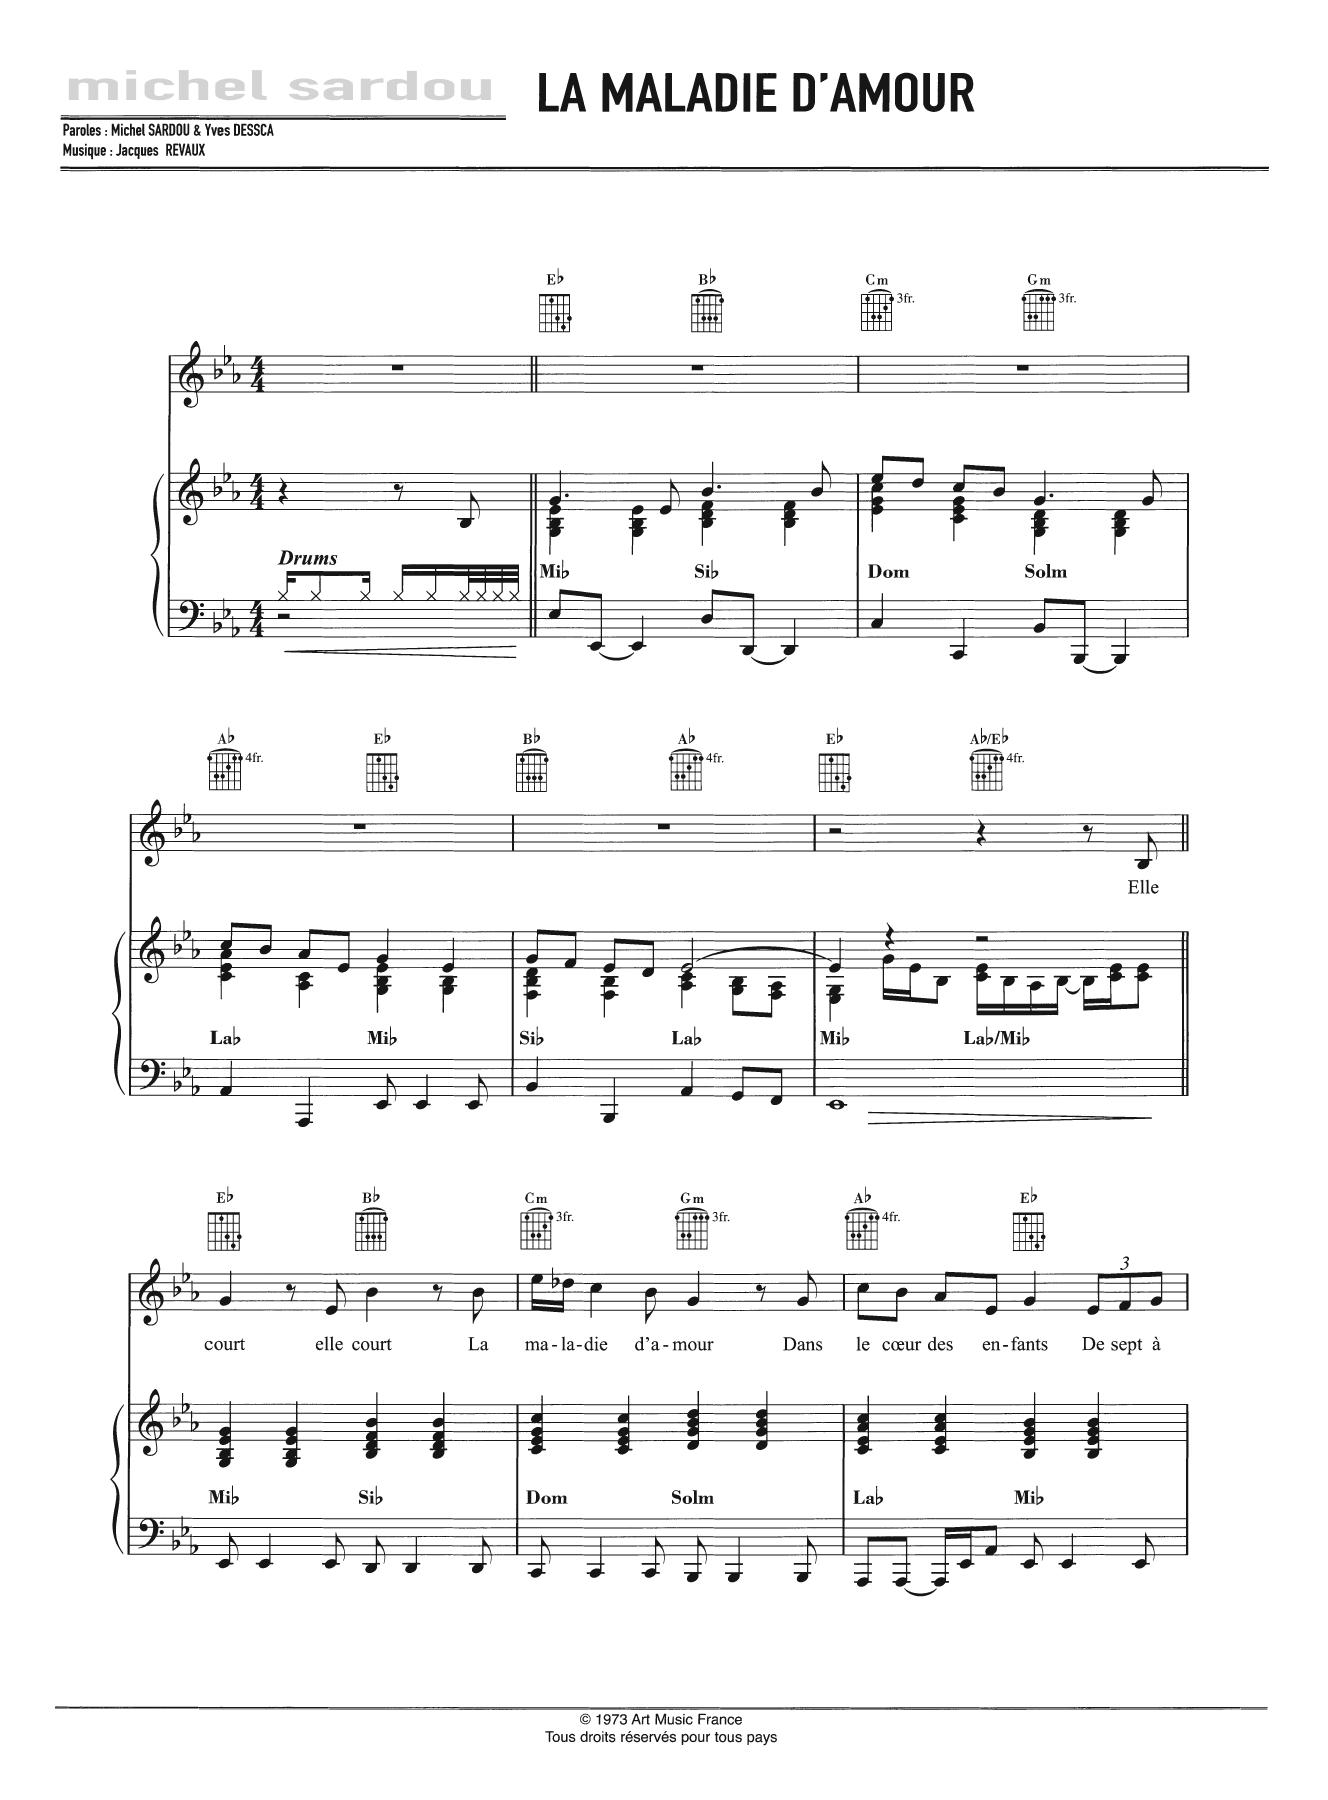 La Maladie D'Amour Sheet Music